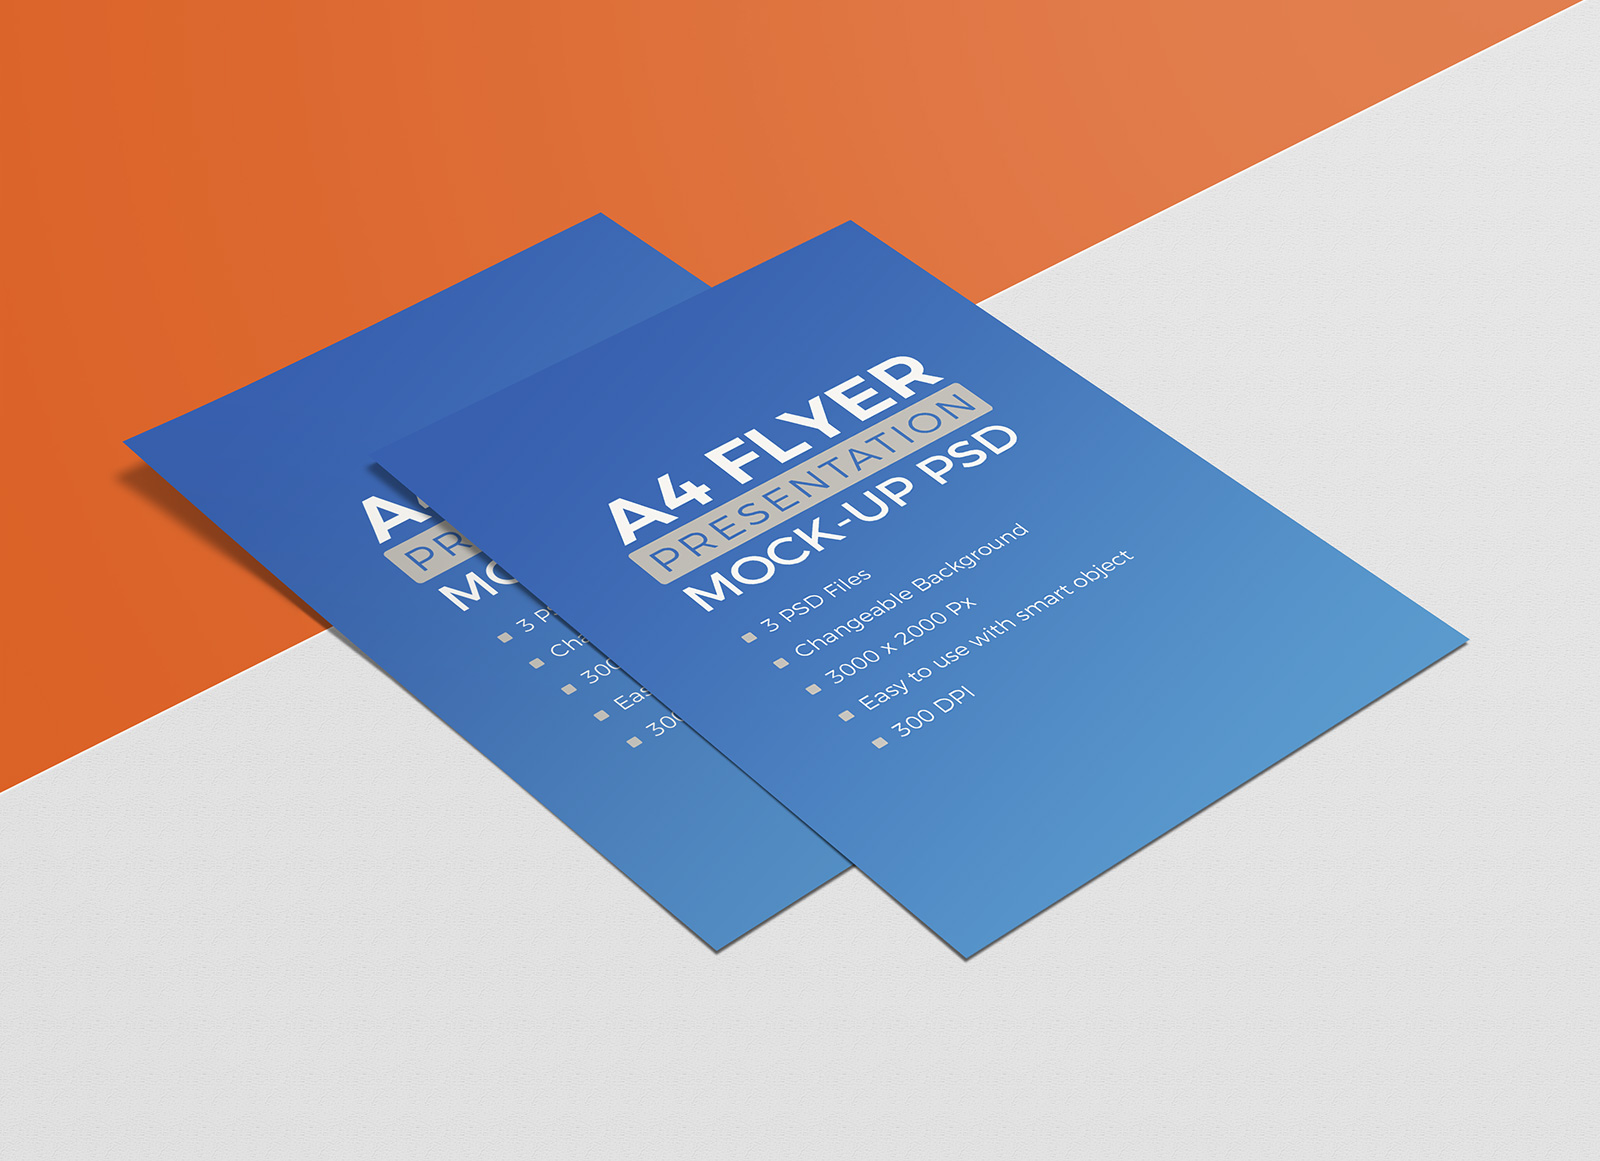 Free-A4-Resume-Letterhead-Flyer-Mockup-PSD-3